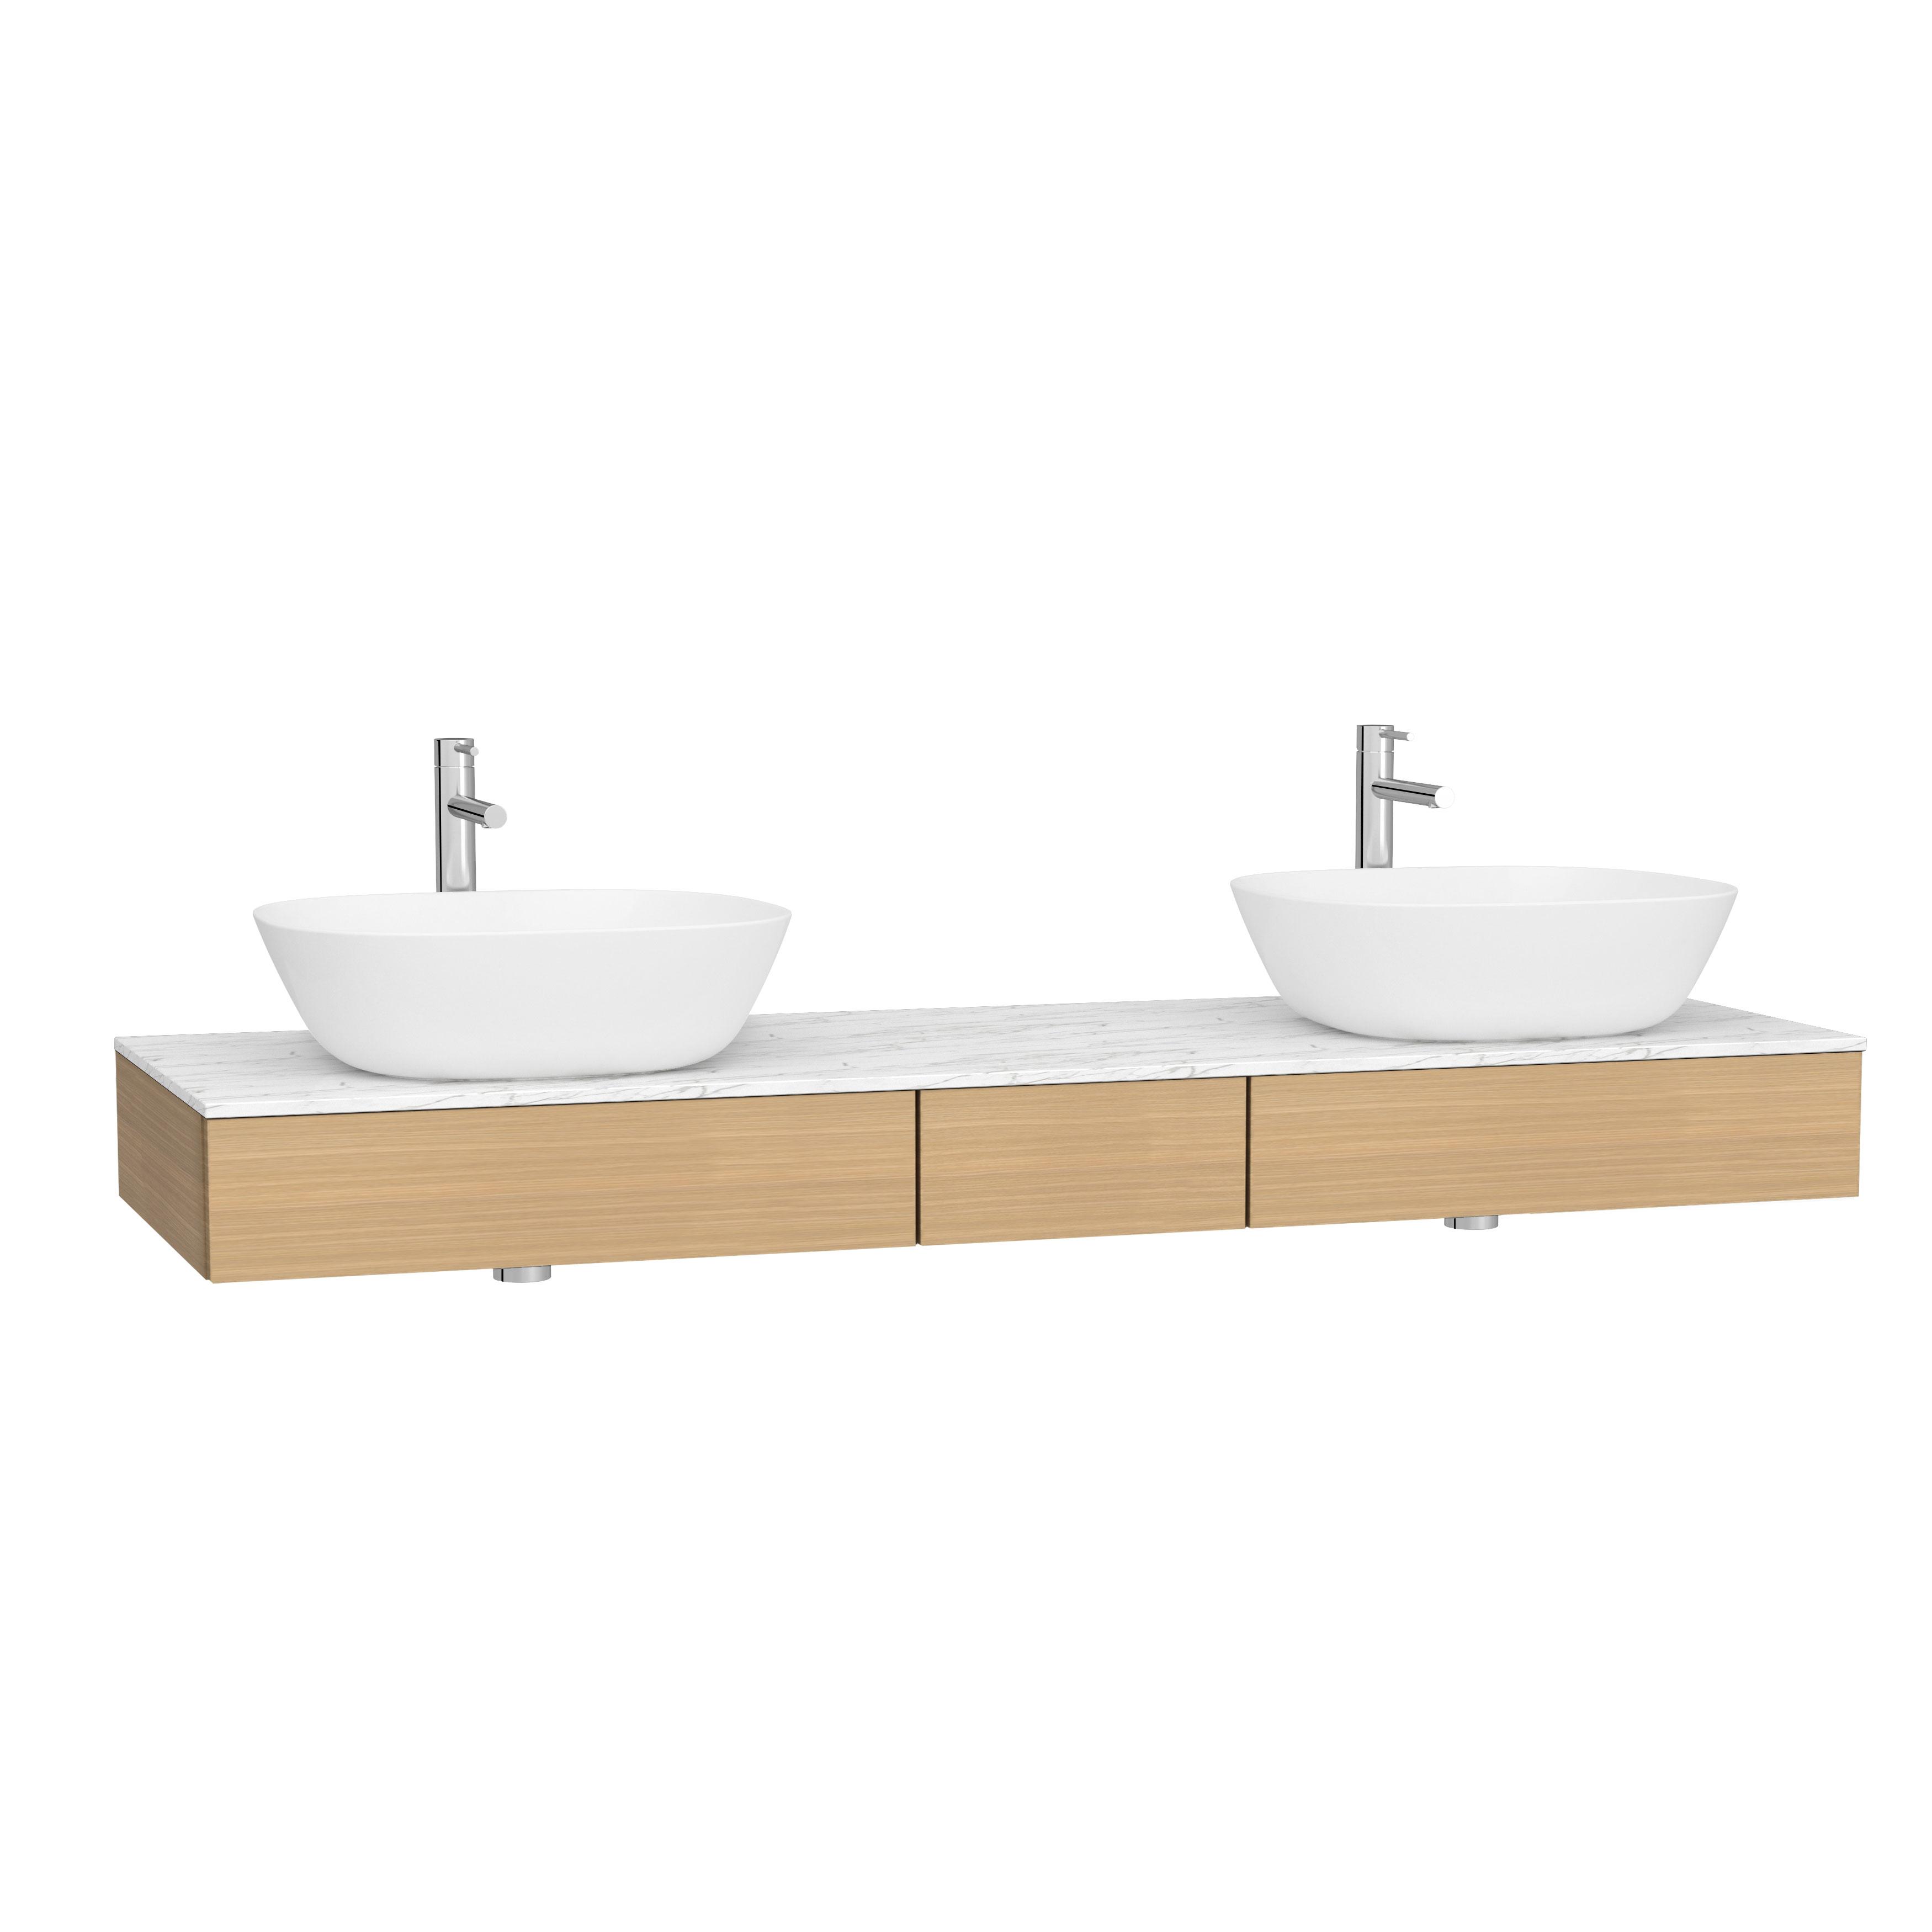 Origin plan de toilette avec tiroir, 150 cm, chêne ferrera, centre